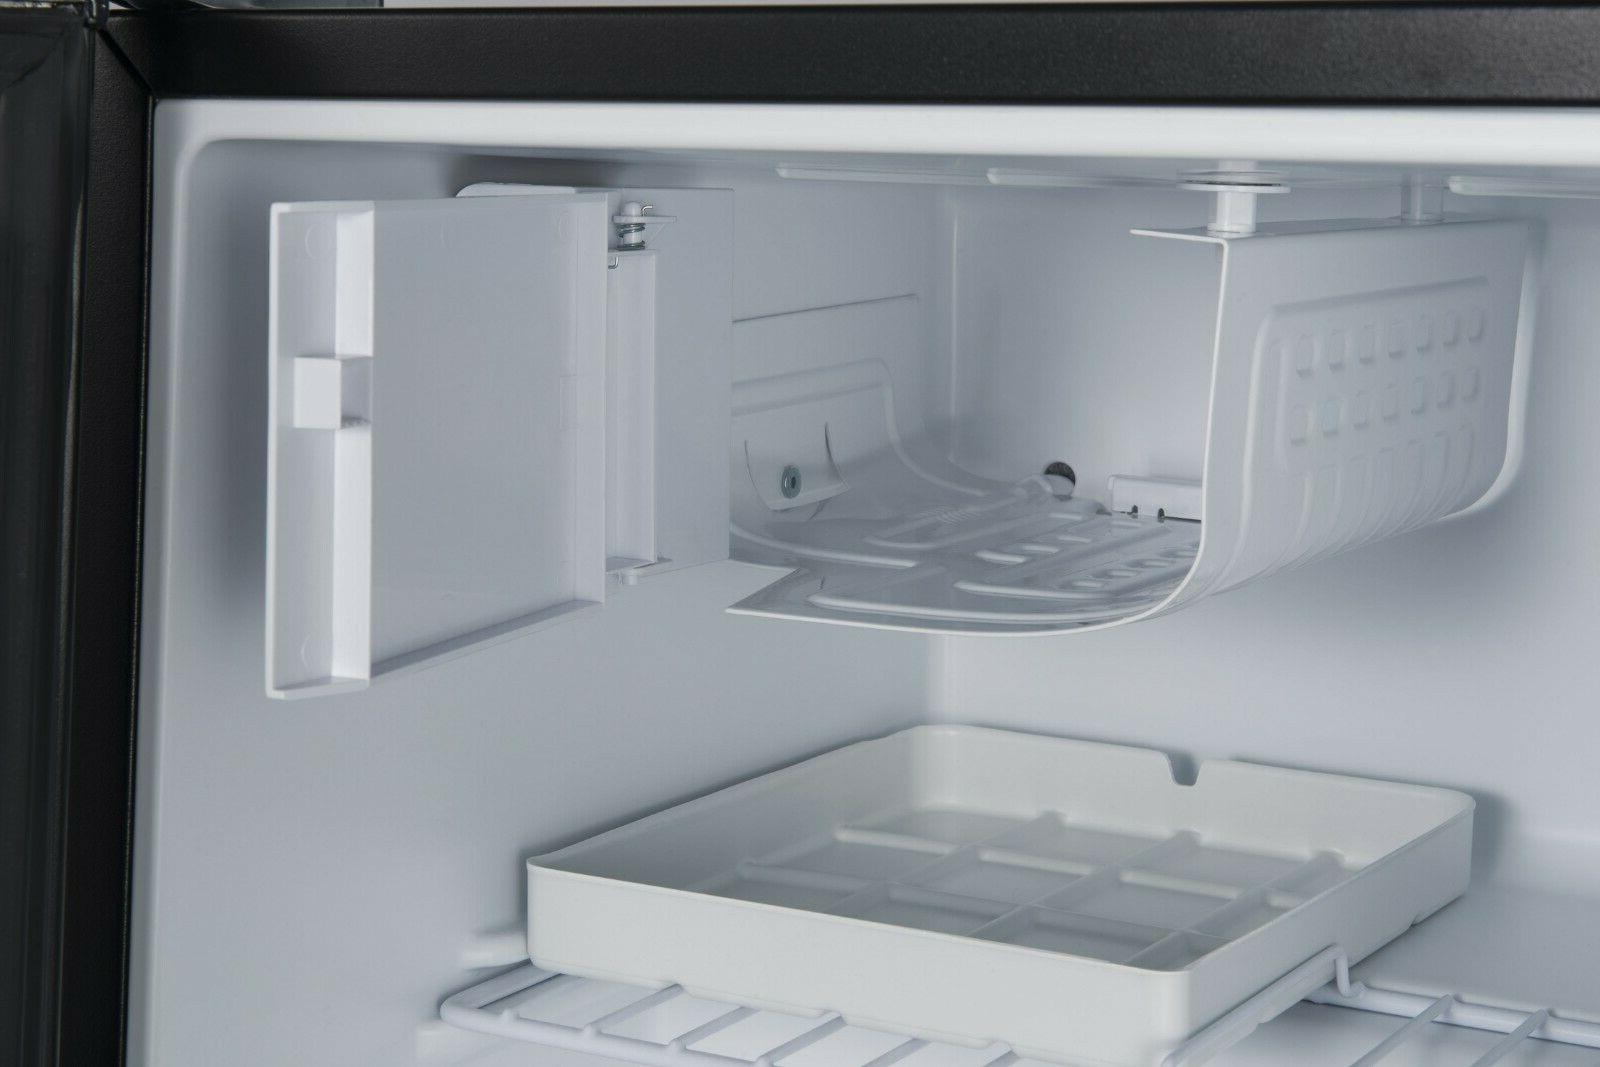 Small Fridge For 1.7 Cu Ft Freezer Compact Dorm